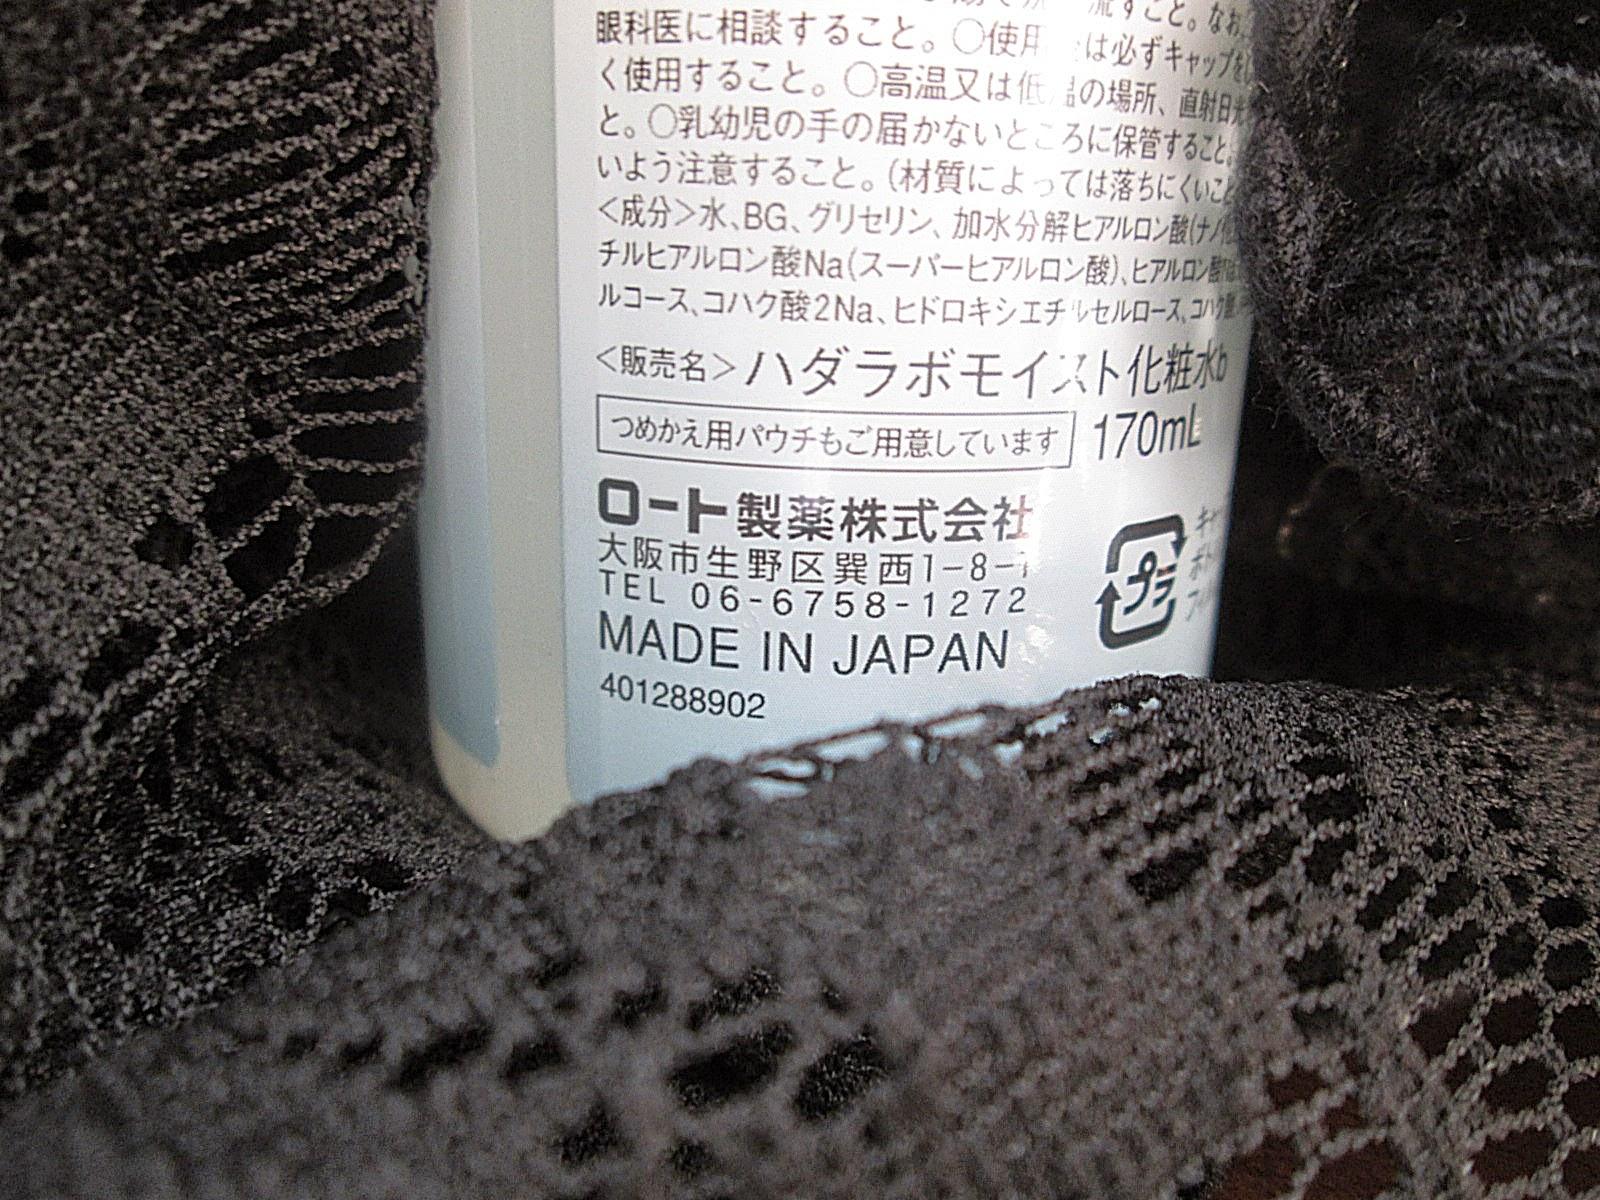 Hada labo hialuronic acid